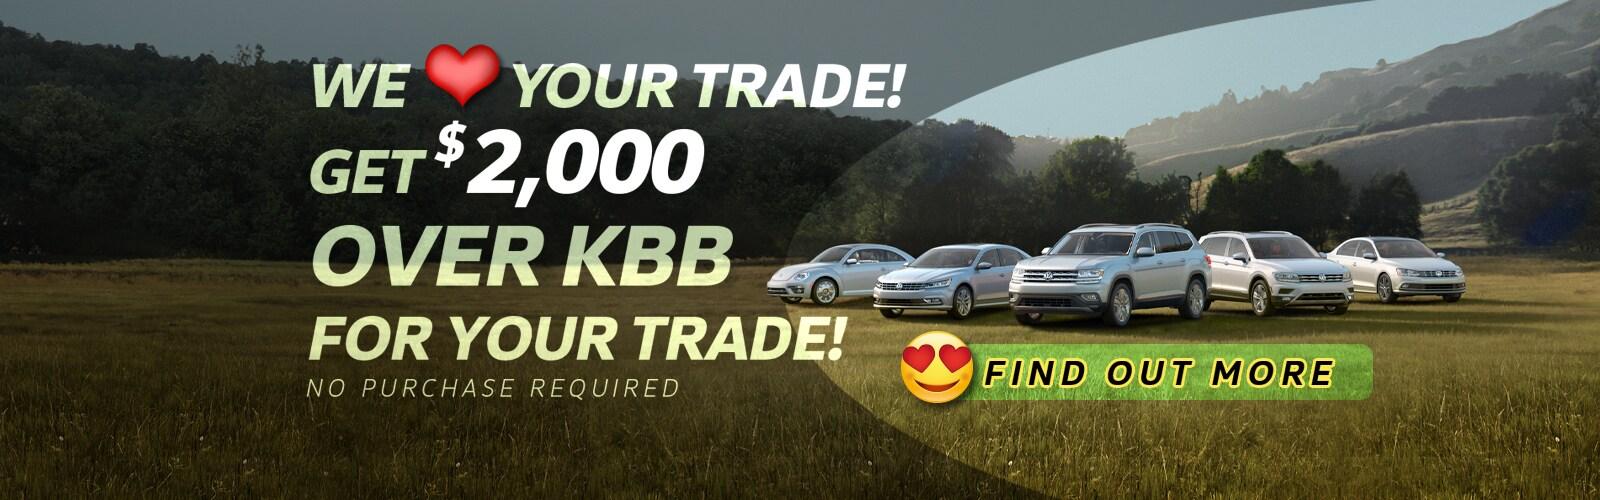 Larry H Miller Subaru >> Larry H Miller Volkswagen Tucson | New VW & Used Car Dealer